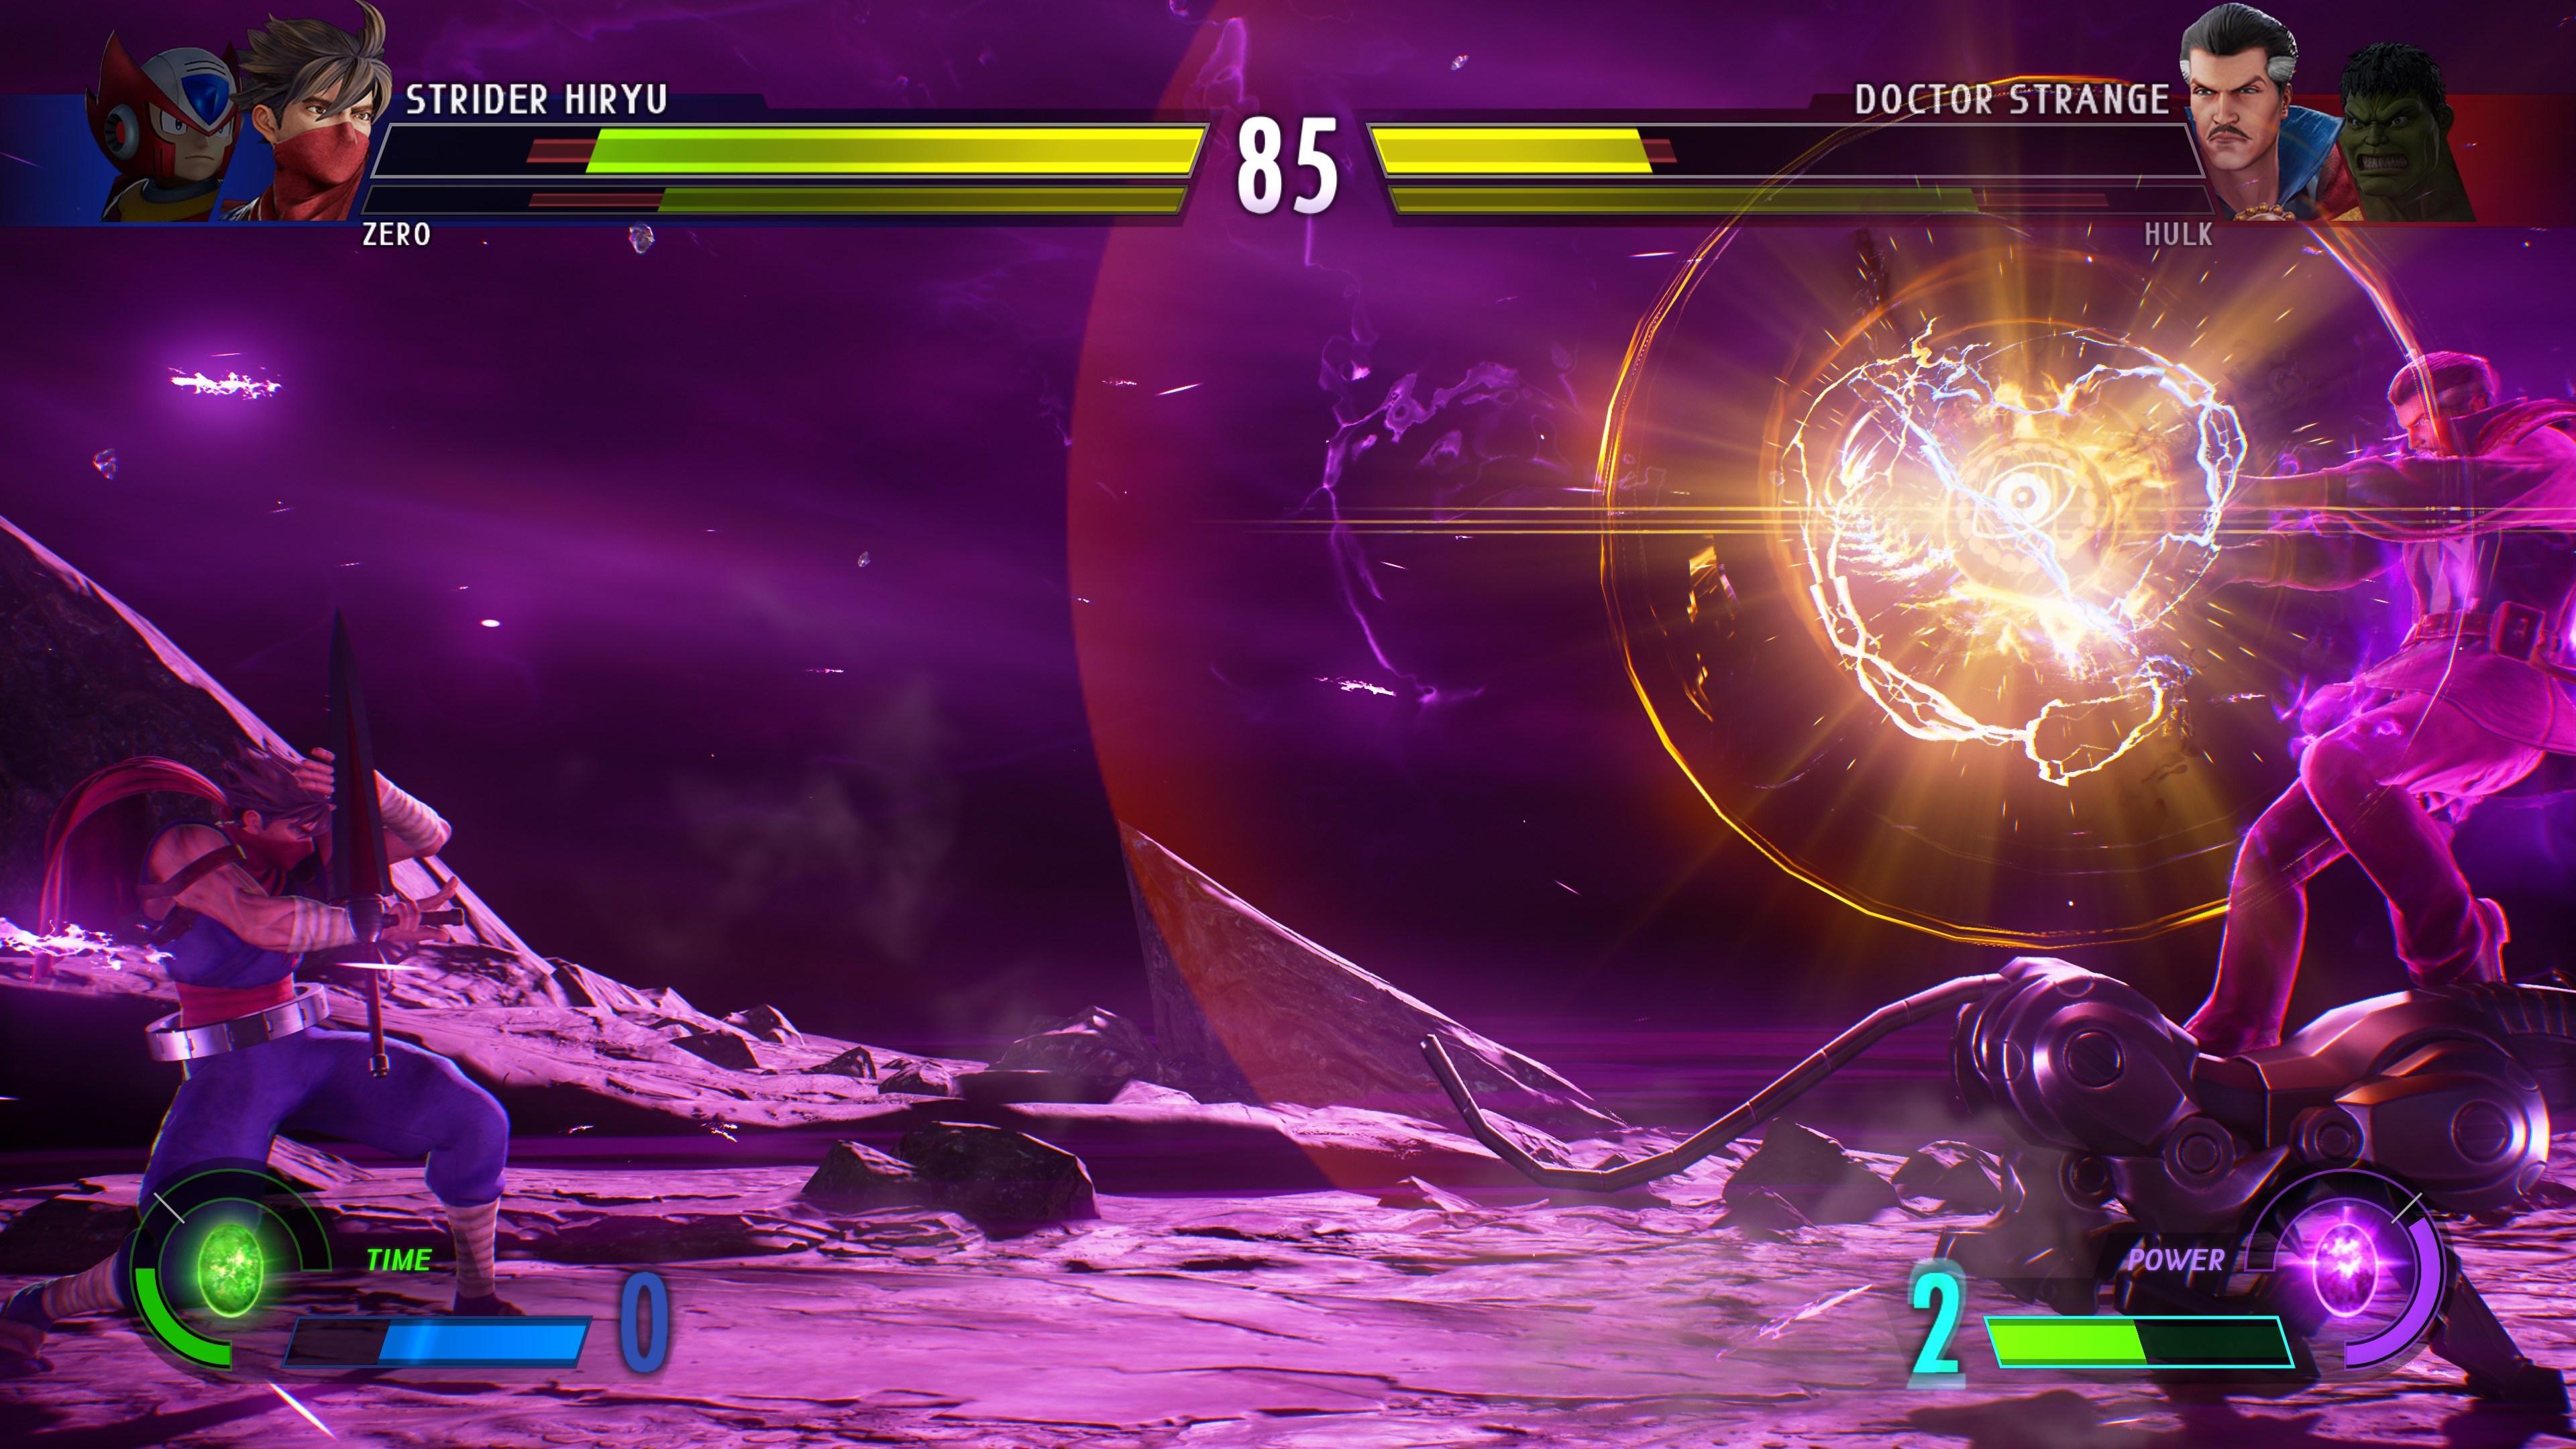 Marvel vs. Capcom: Infinite - Marvel vs. Capcom: Infinite